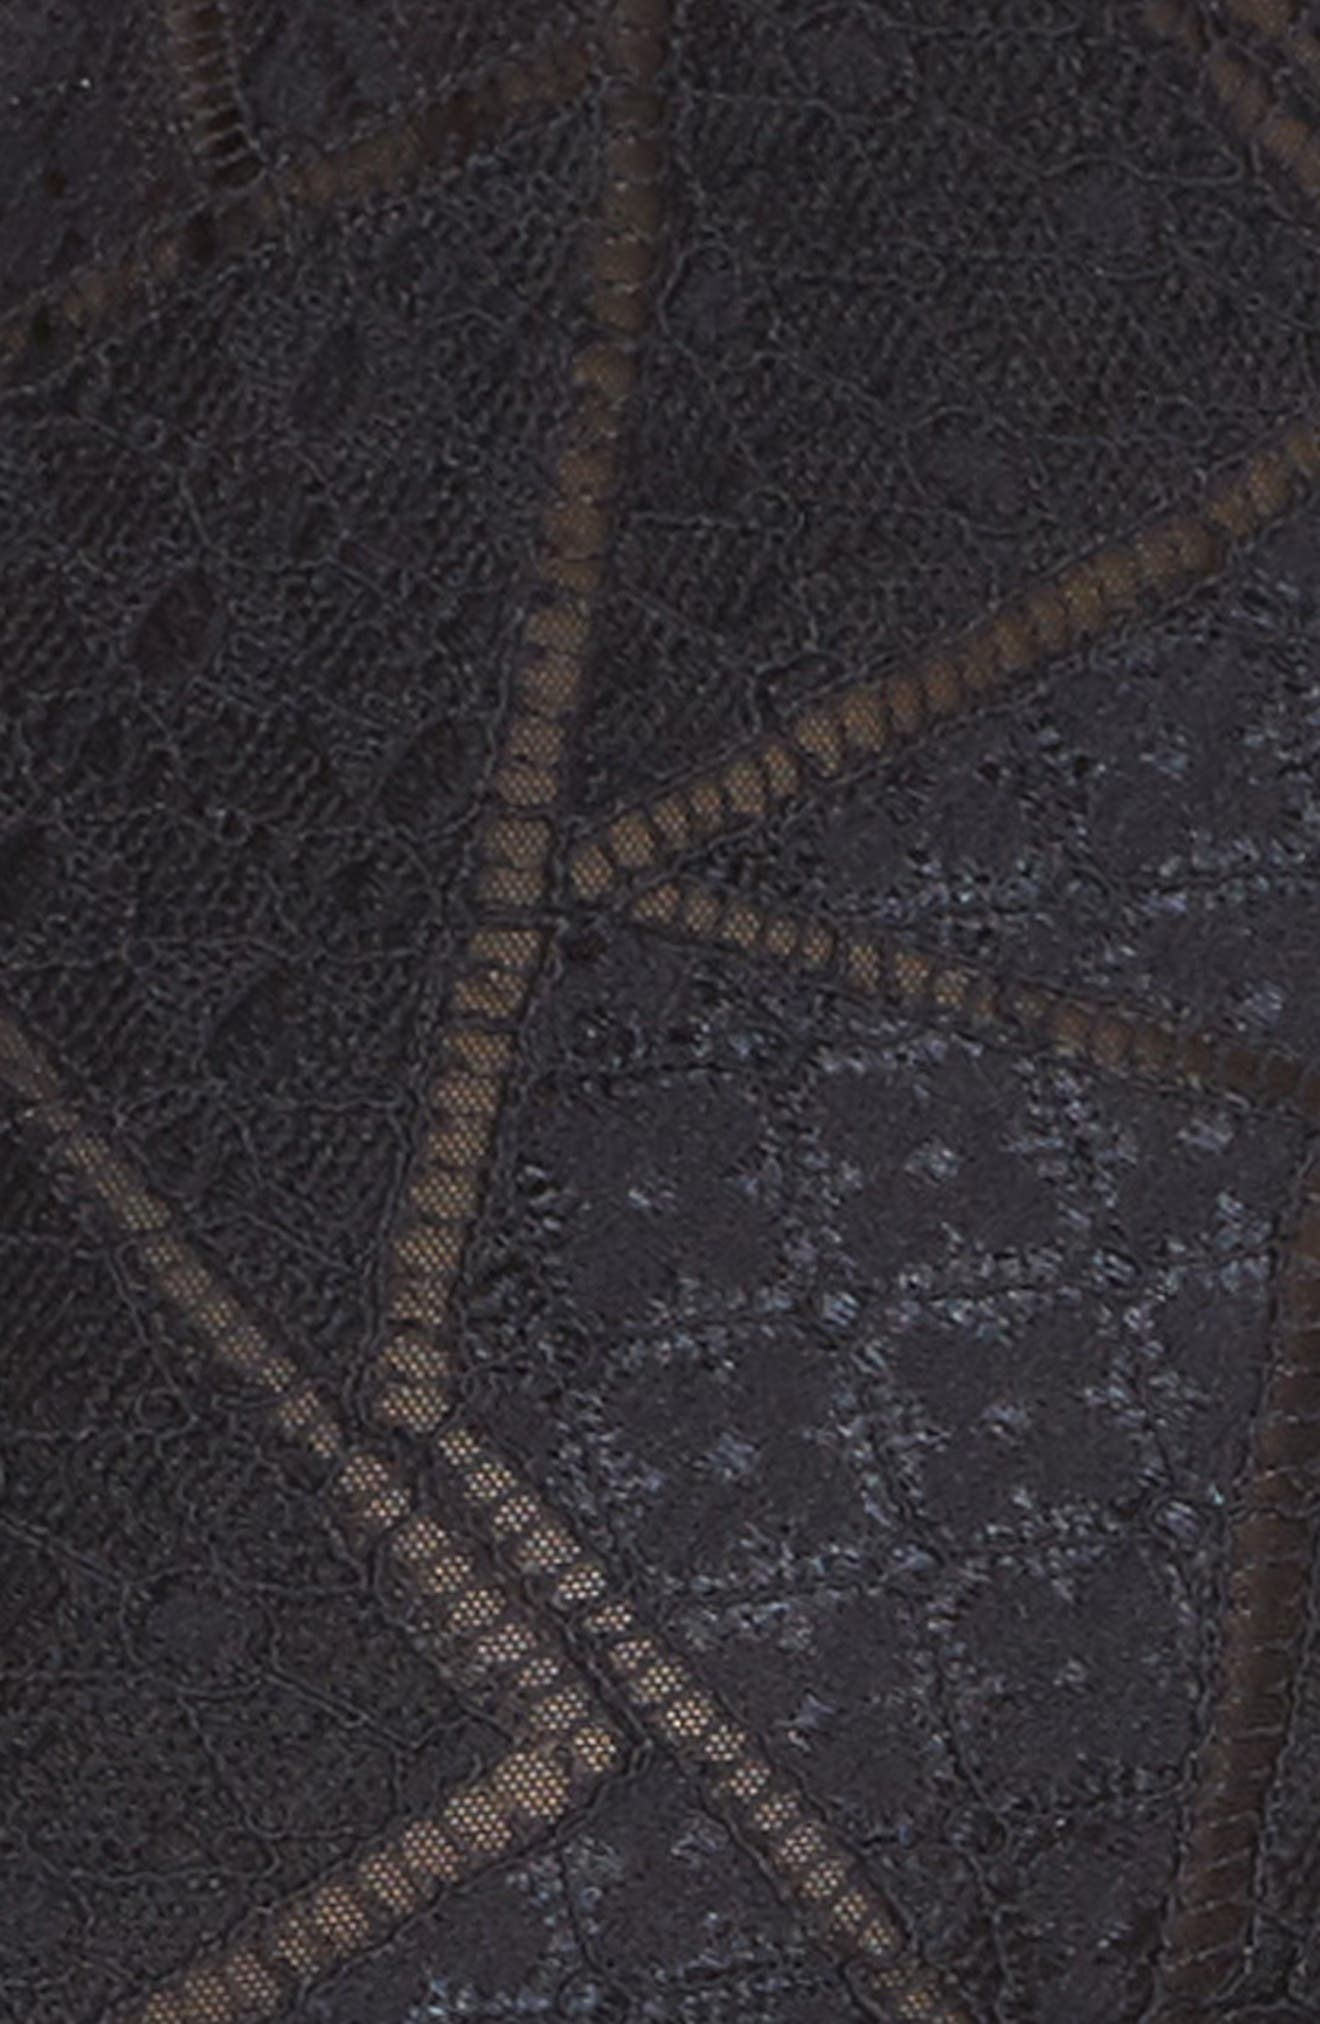 Intimately FP Moonstruck Lace Longline Halter Bralette,                             Alternate thumbnail 4, color,                             001